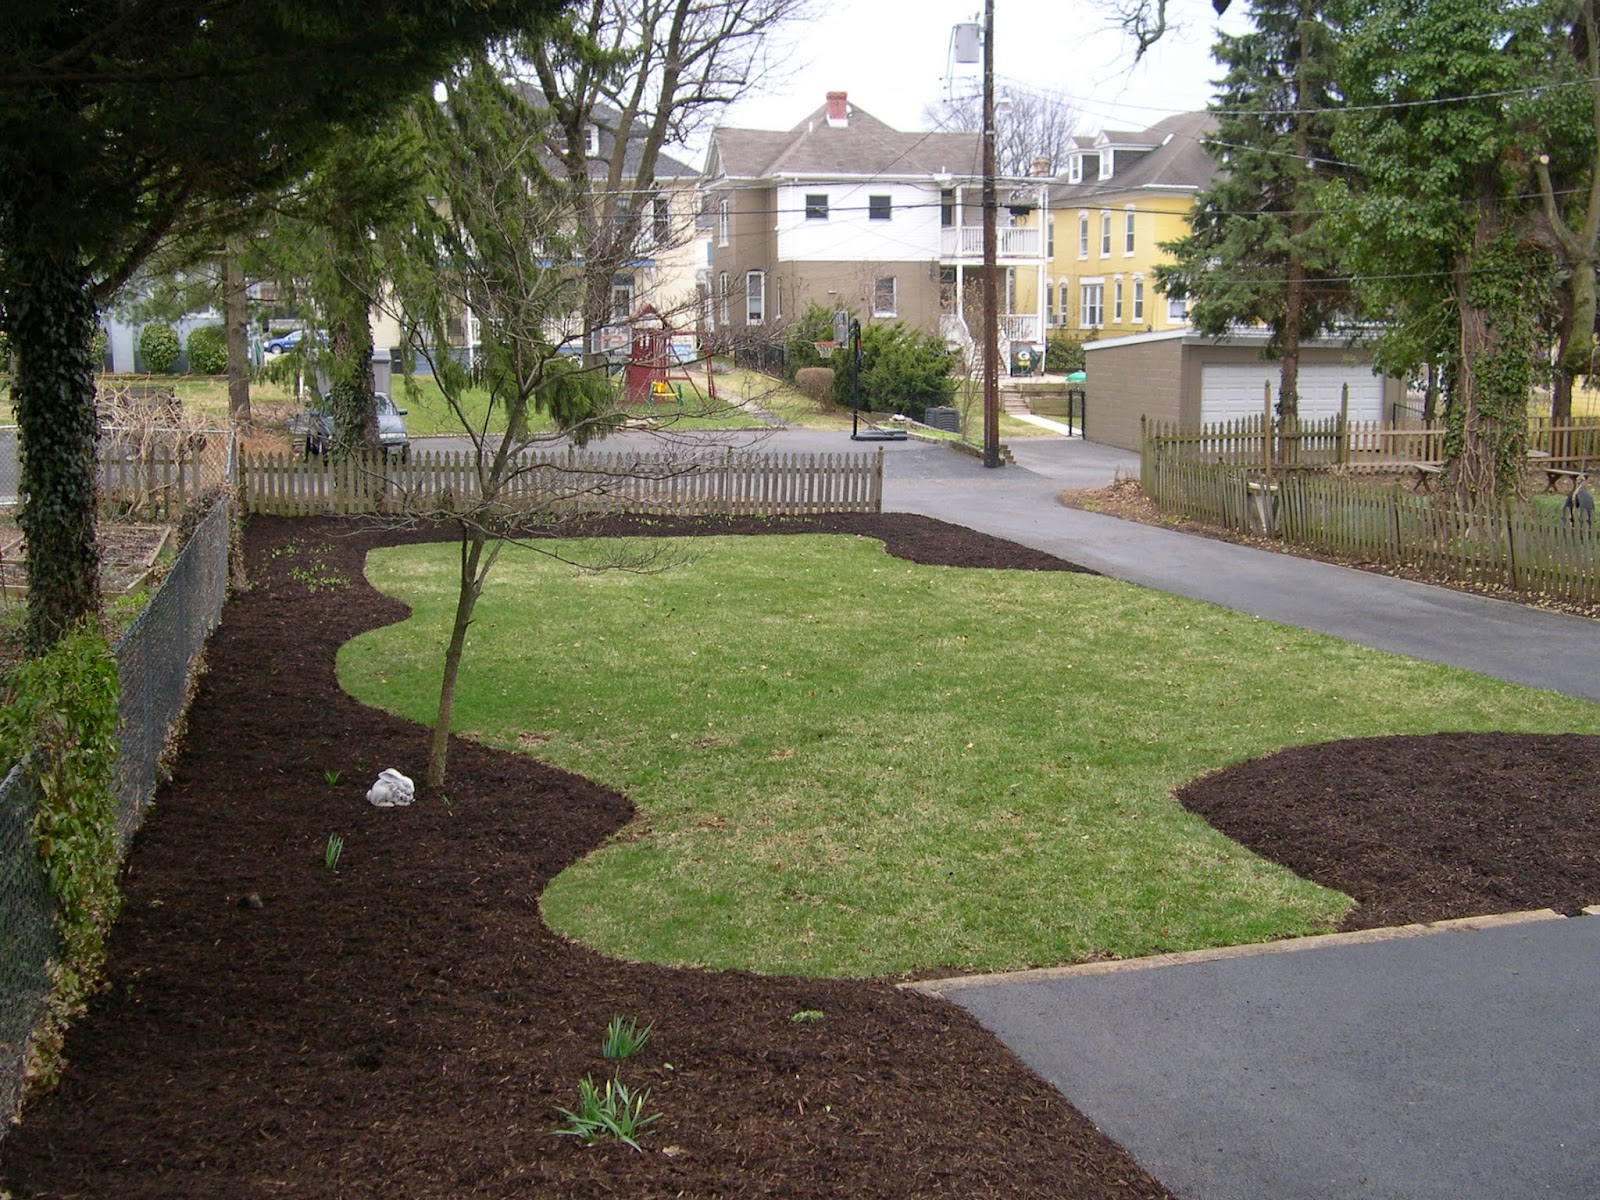 groshs lawn service adding new mulch in williamsport md